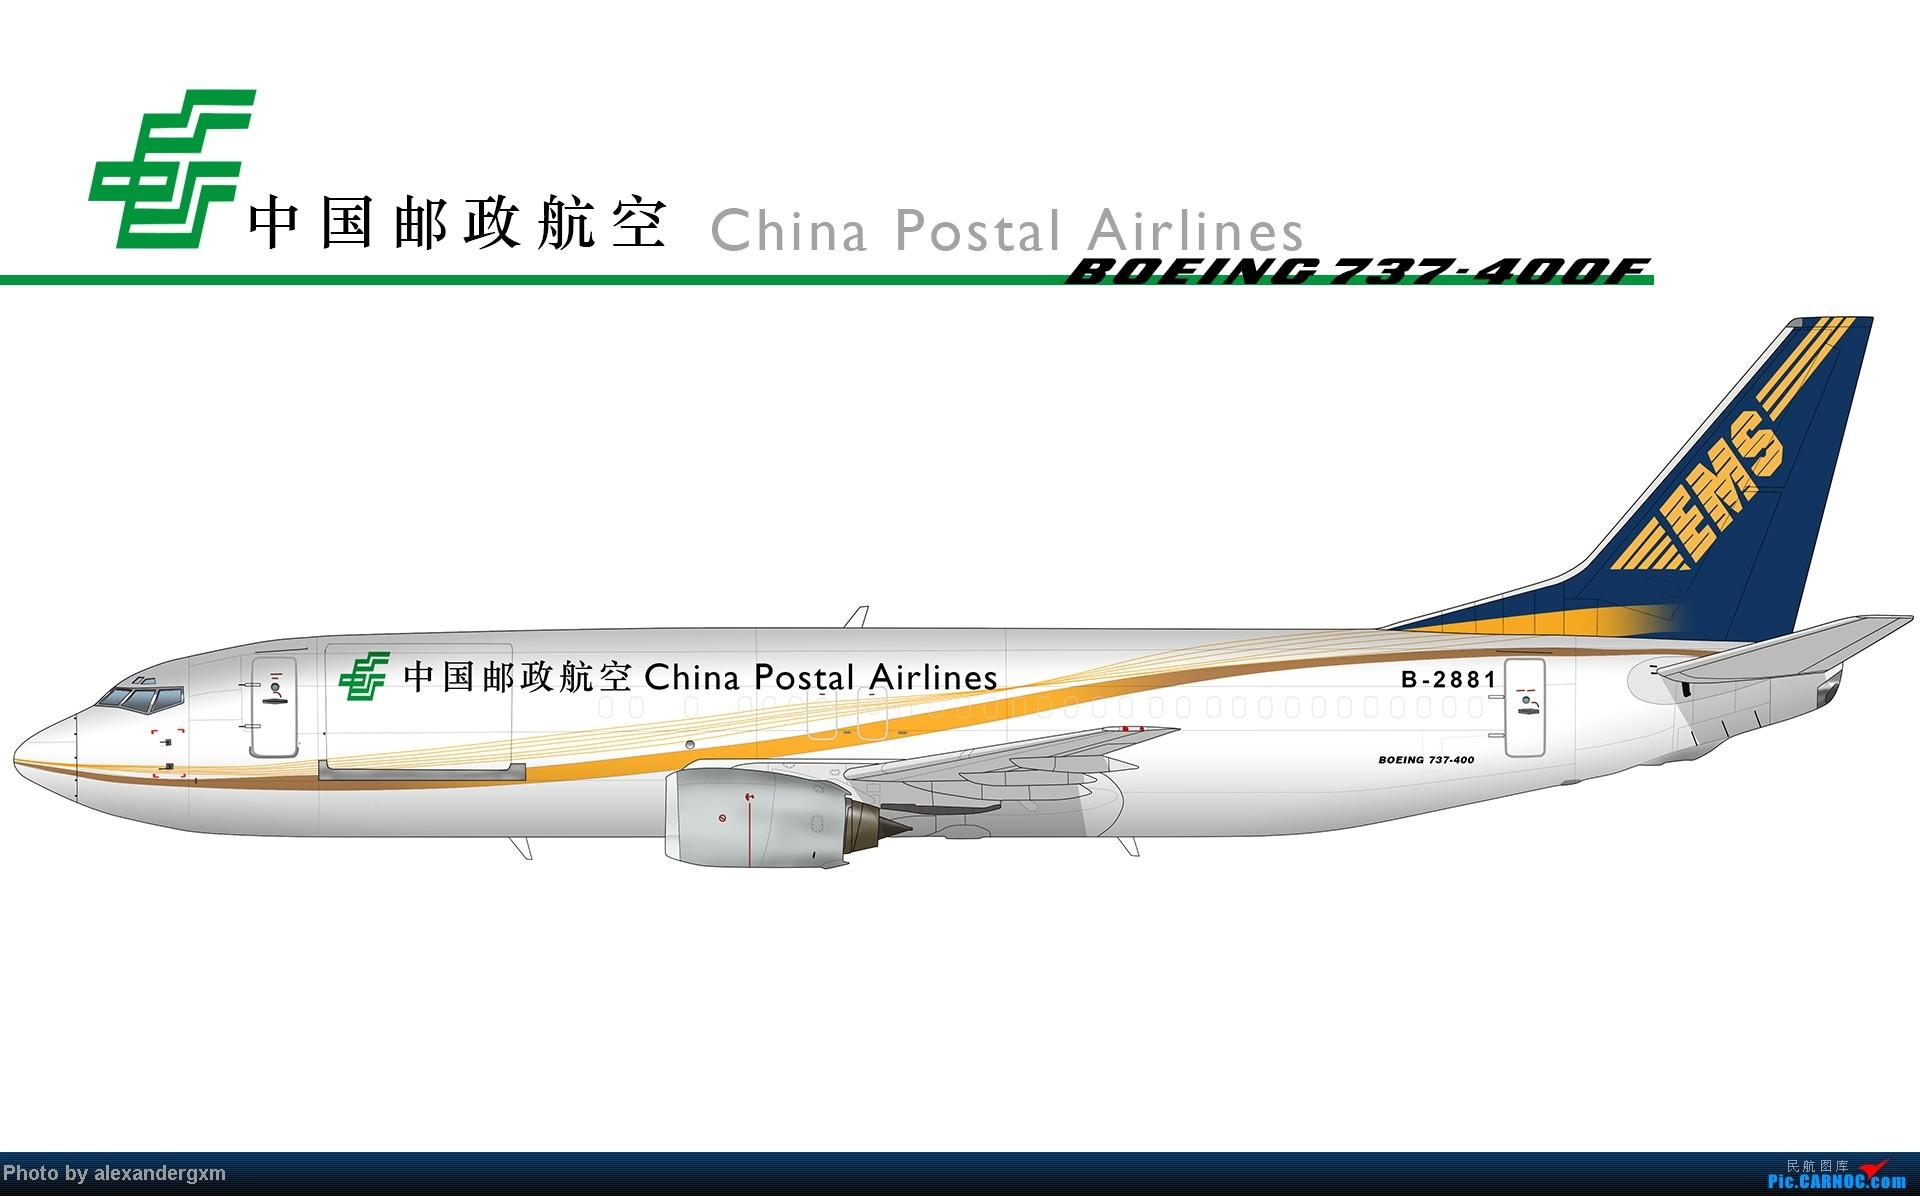 Re:[原创]发一些自己业余画的一些飞机啦~大部分侧视图~ BOEING 737-400 B-2881